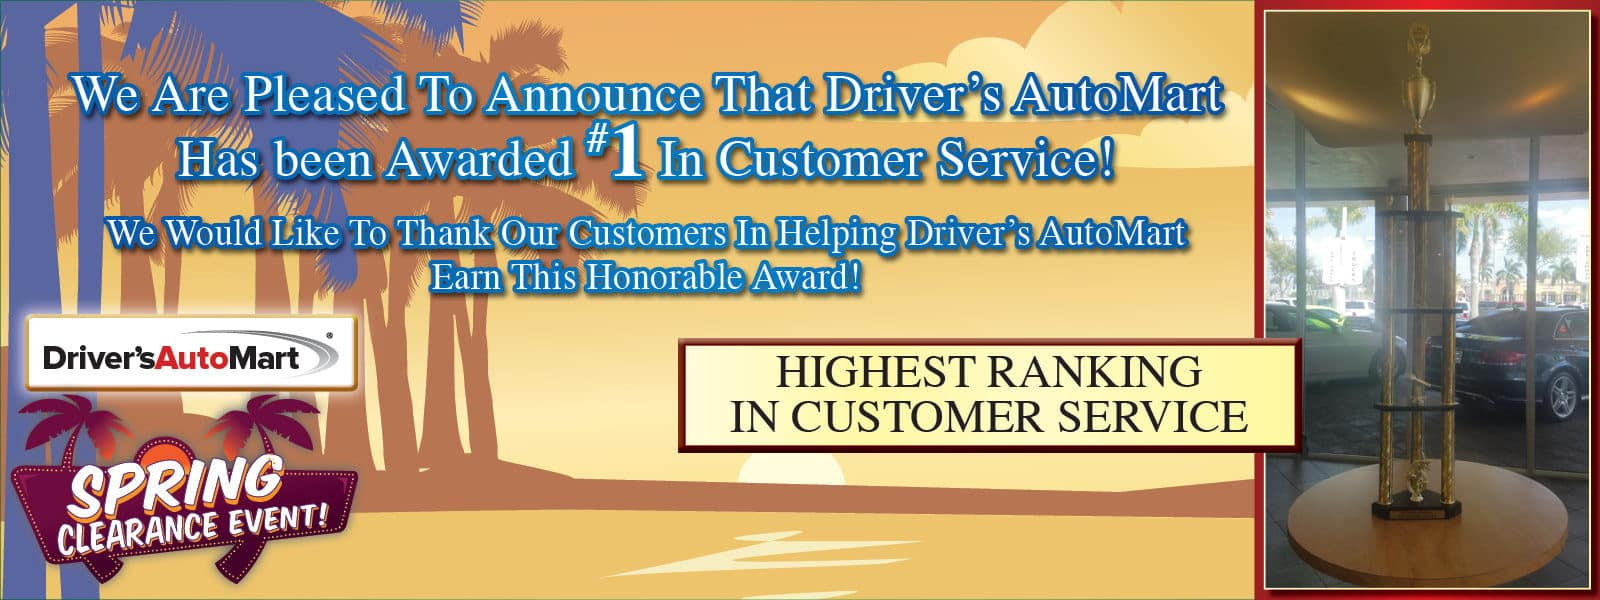 67947-DAUM_WebTile_Award_1600x600-Apr2018